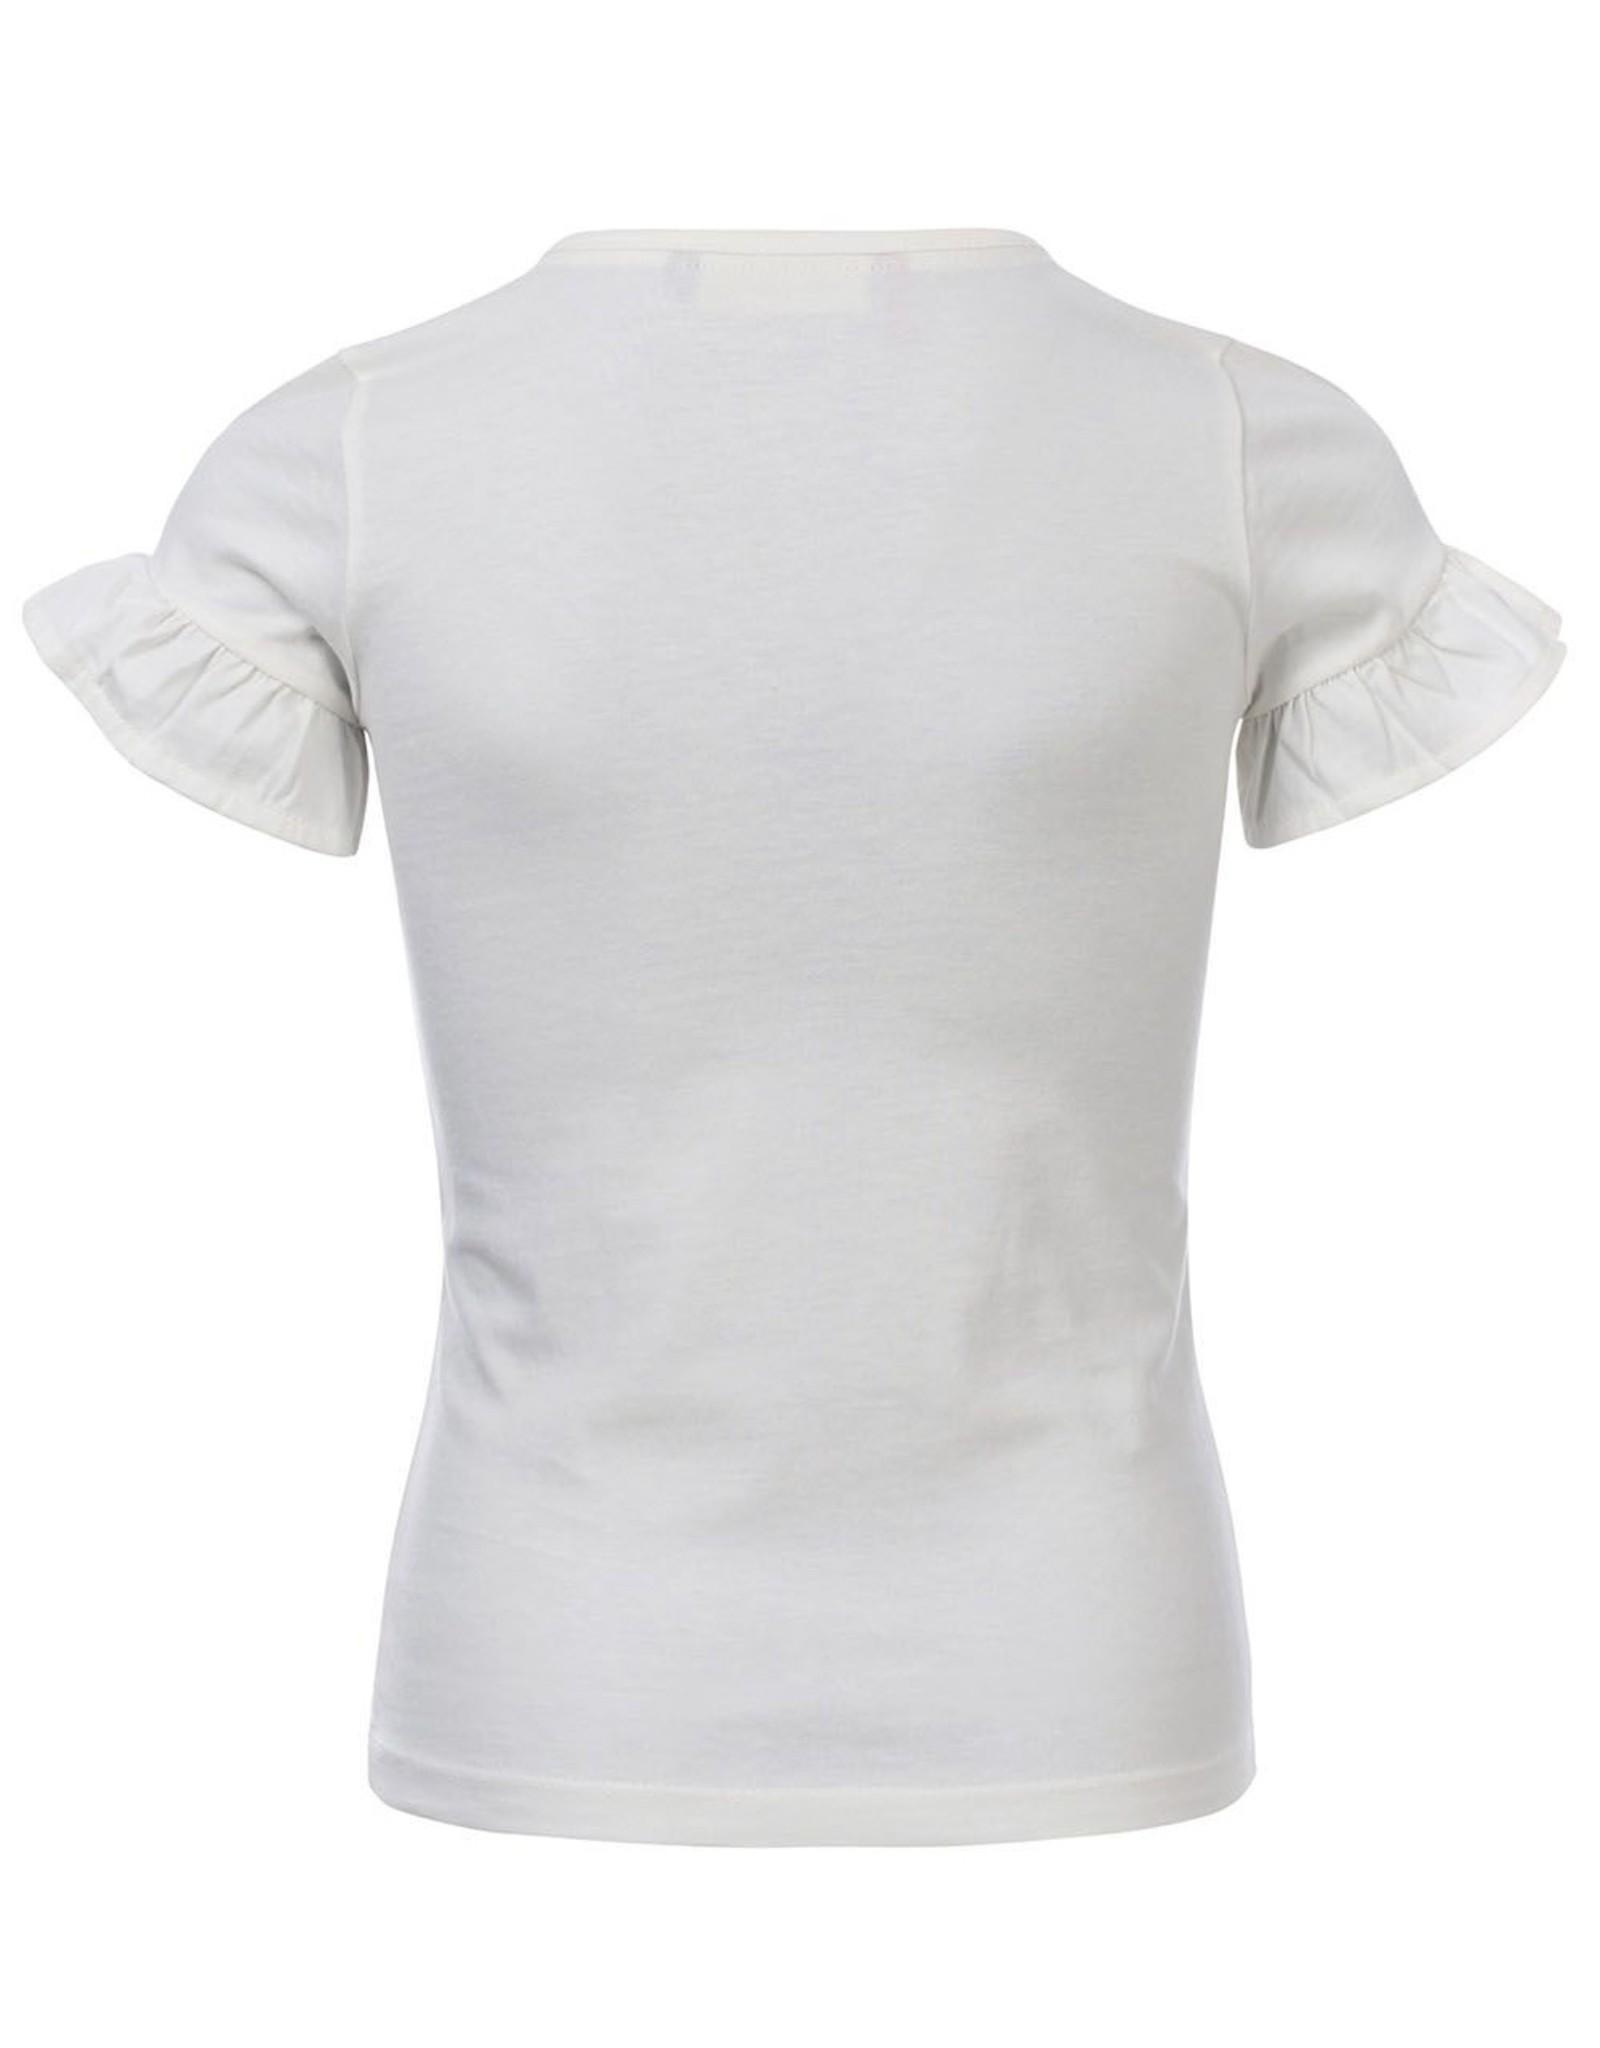 looxs 2113-7488 T-Shirt